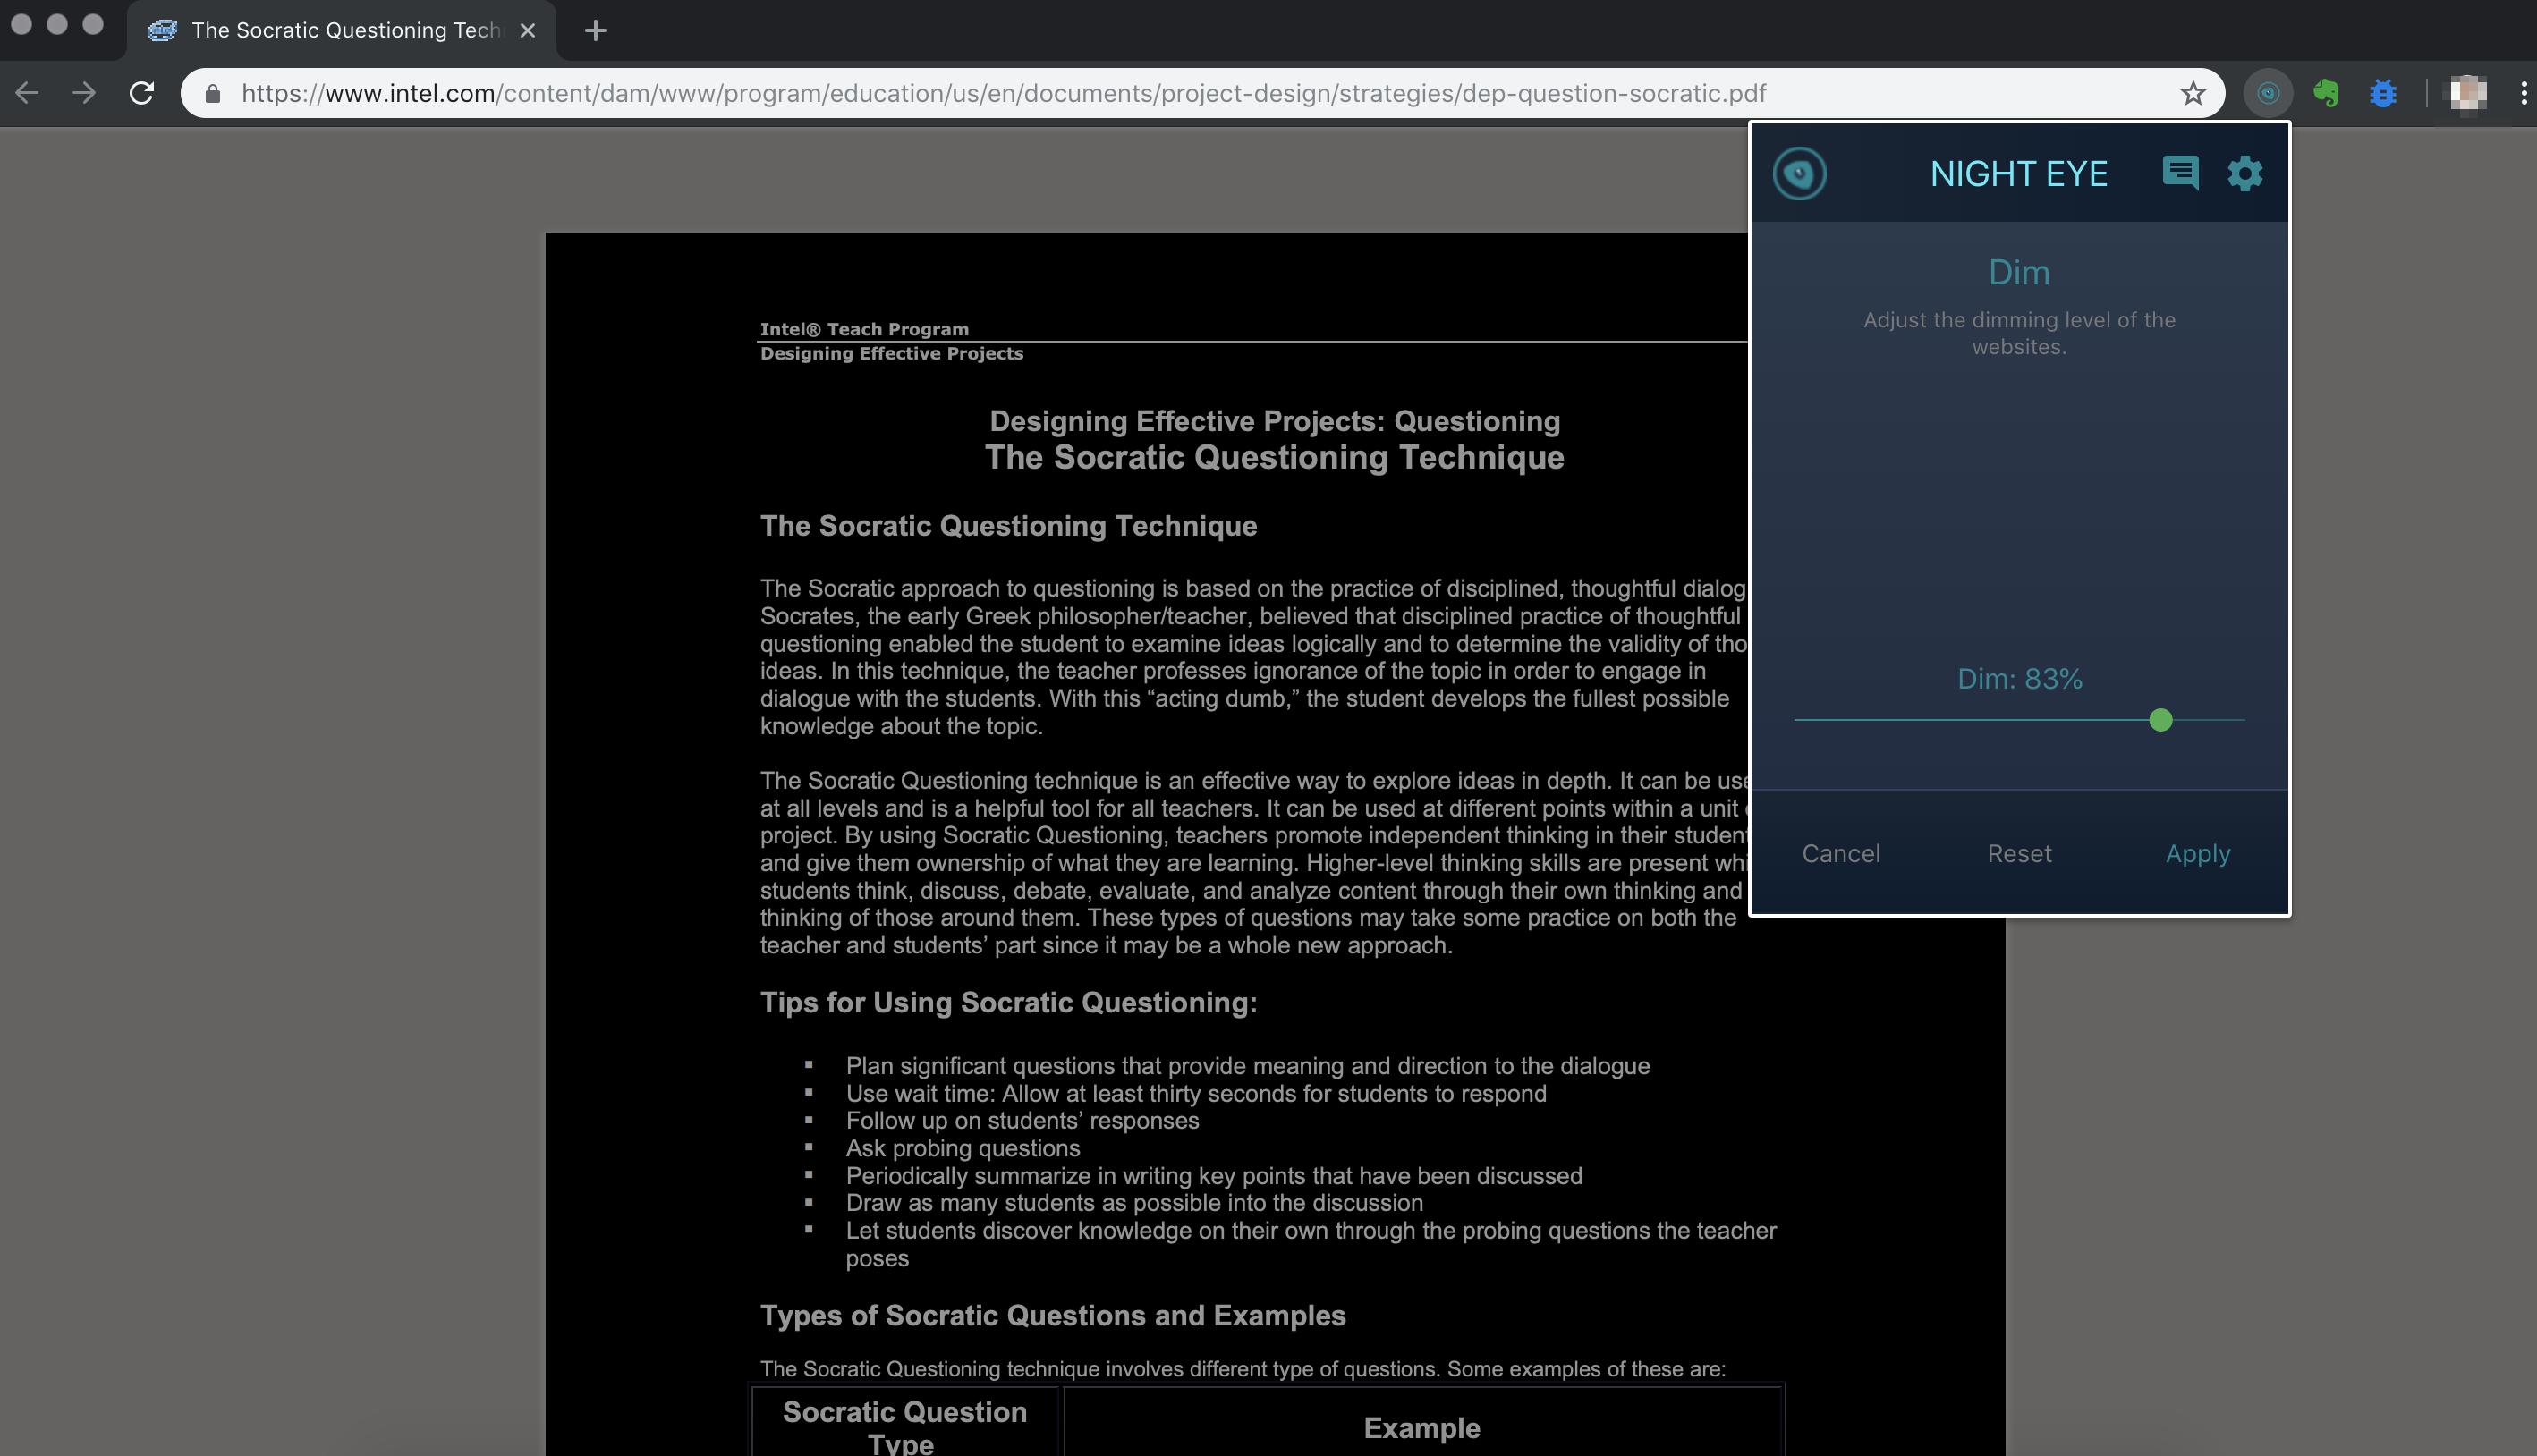 pdf-Dark-mode-and-filtering